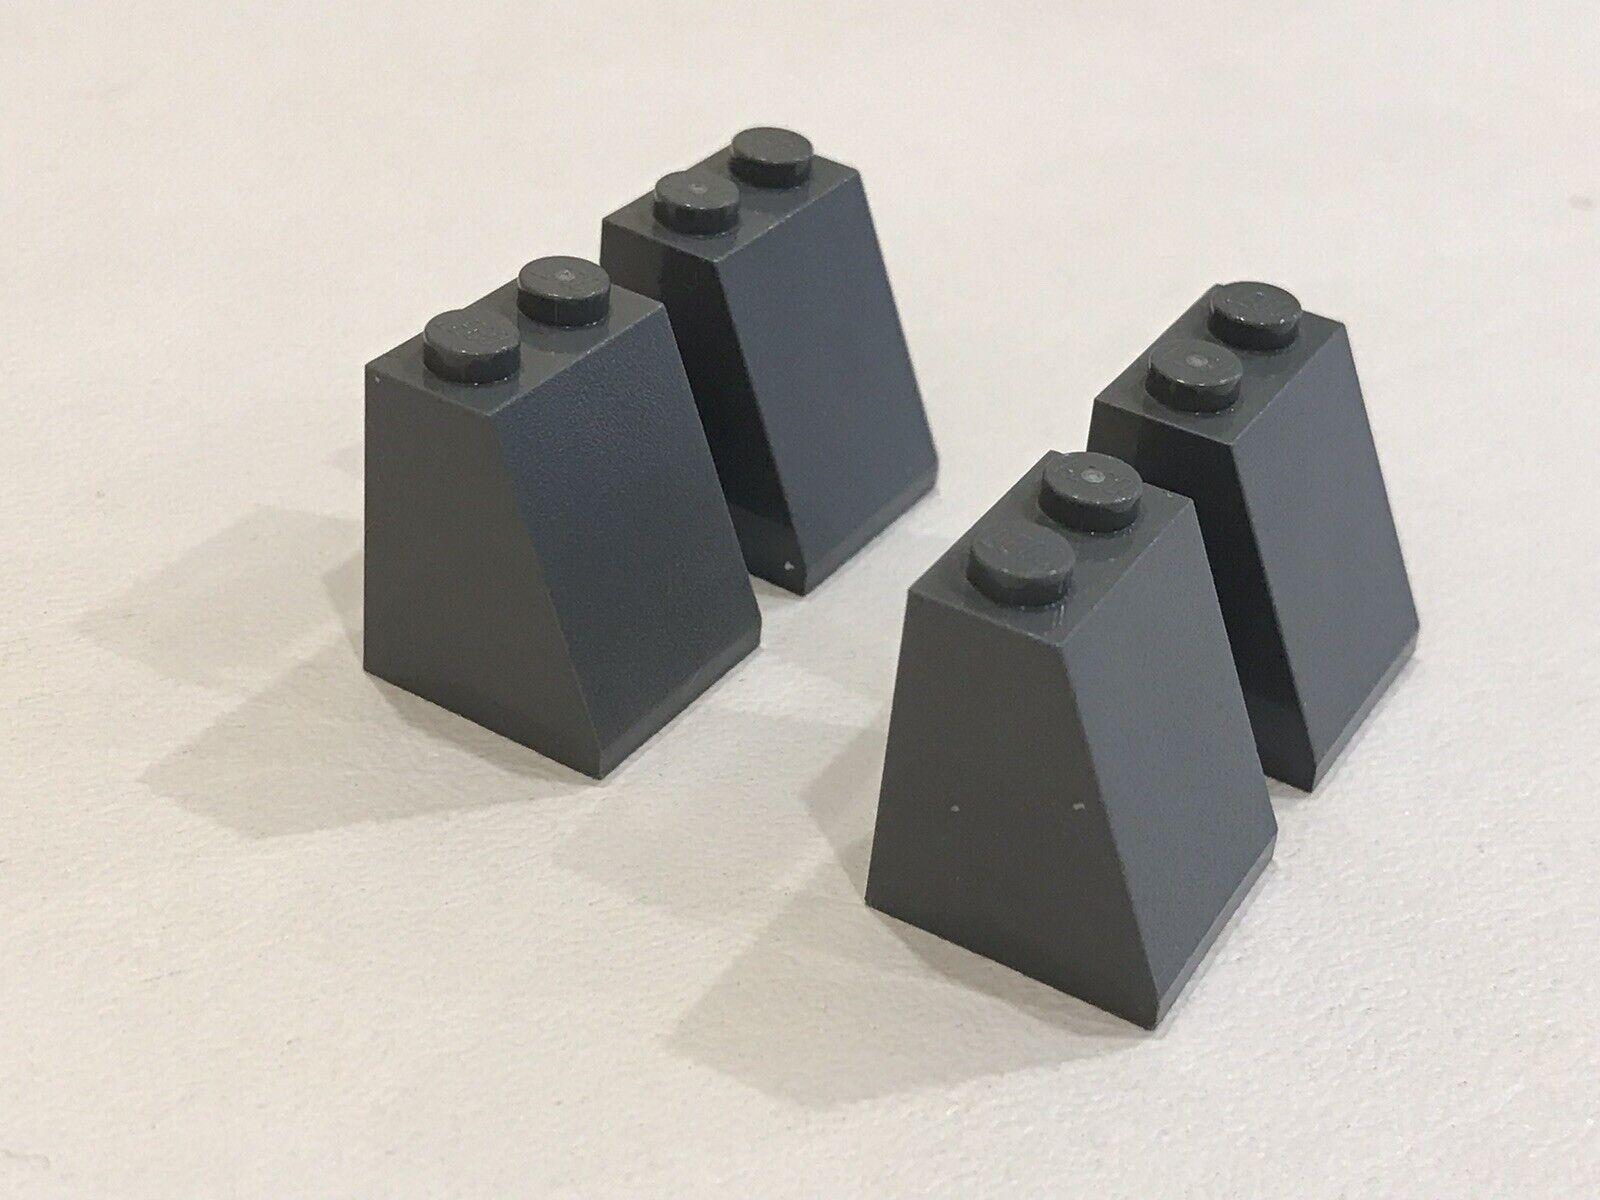 LEGO 20 x Schrägstein rotbraun Reddish Brown Slope 65 2x2x2 Bottom Tube 3678b